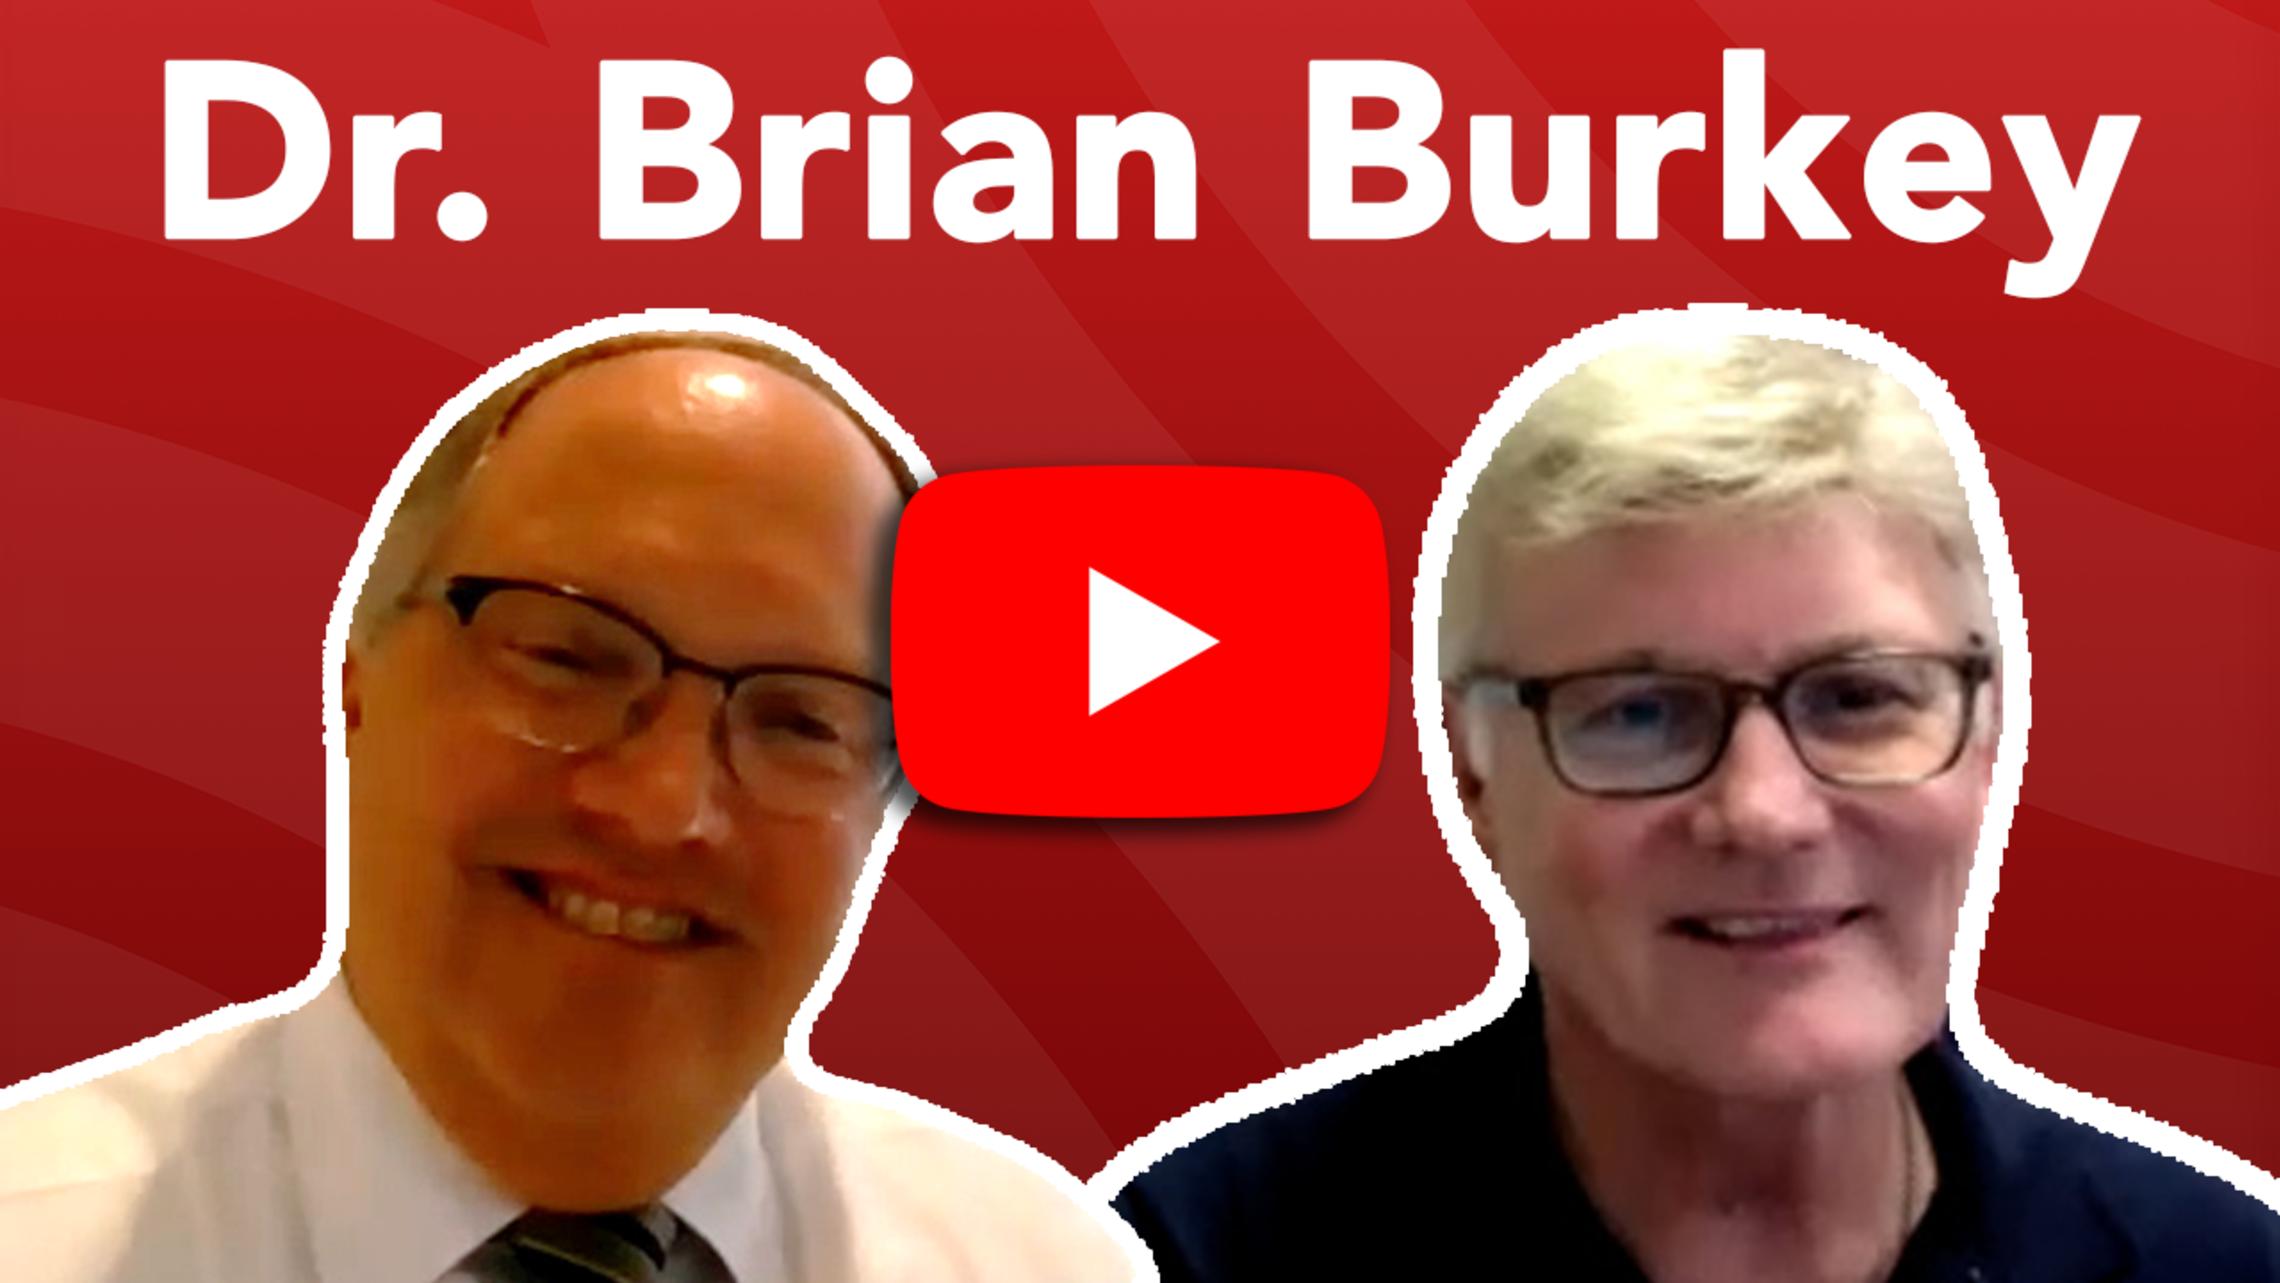 Dr. Brian Burkey Tn Website